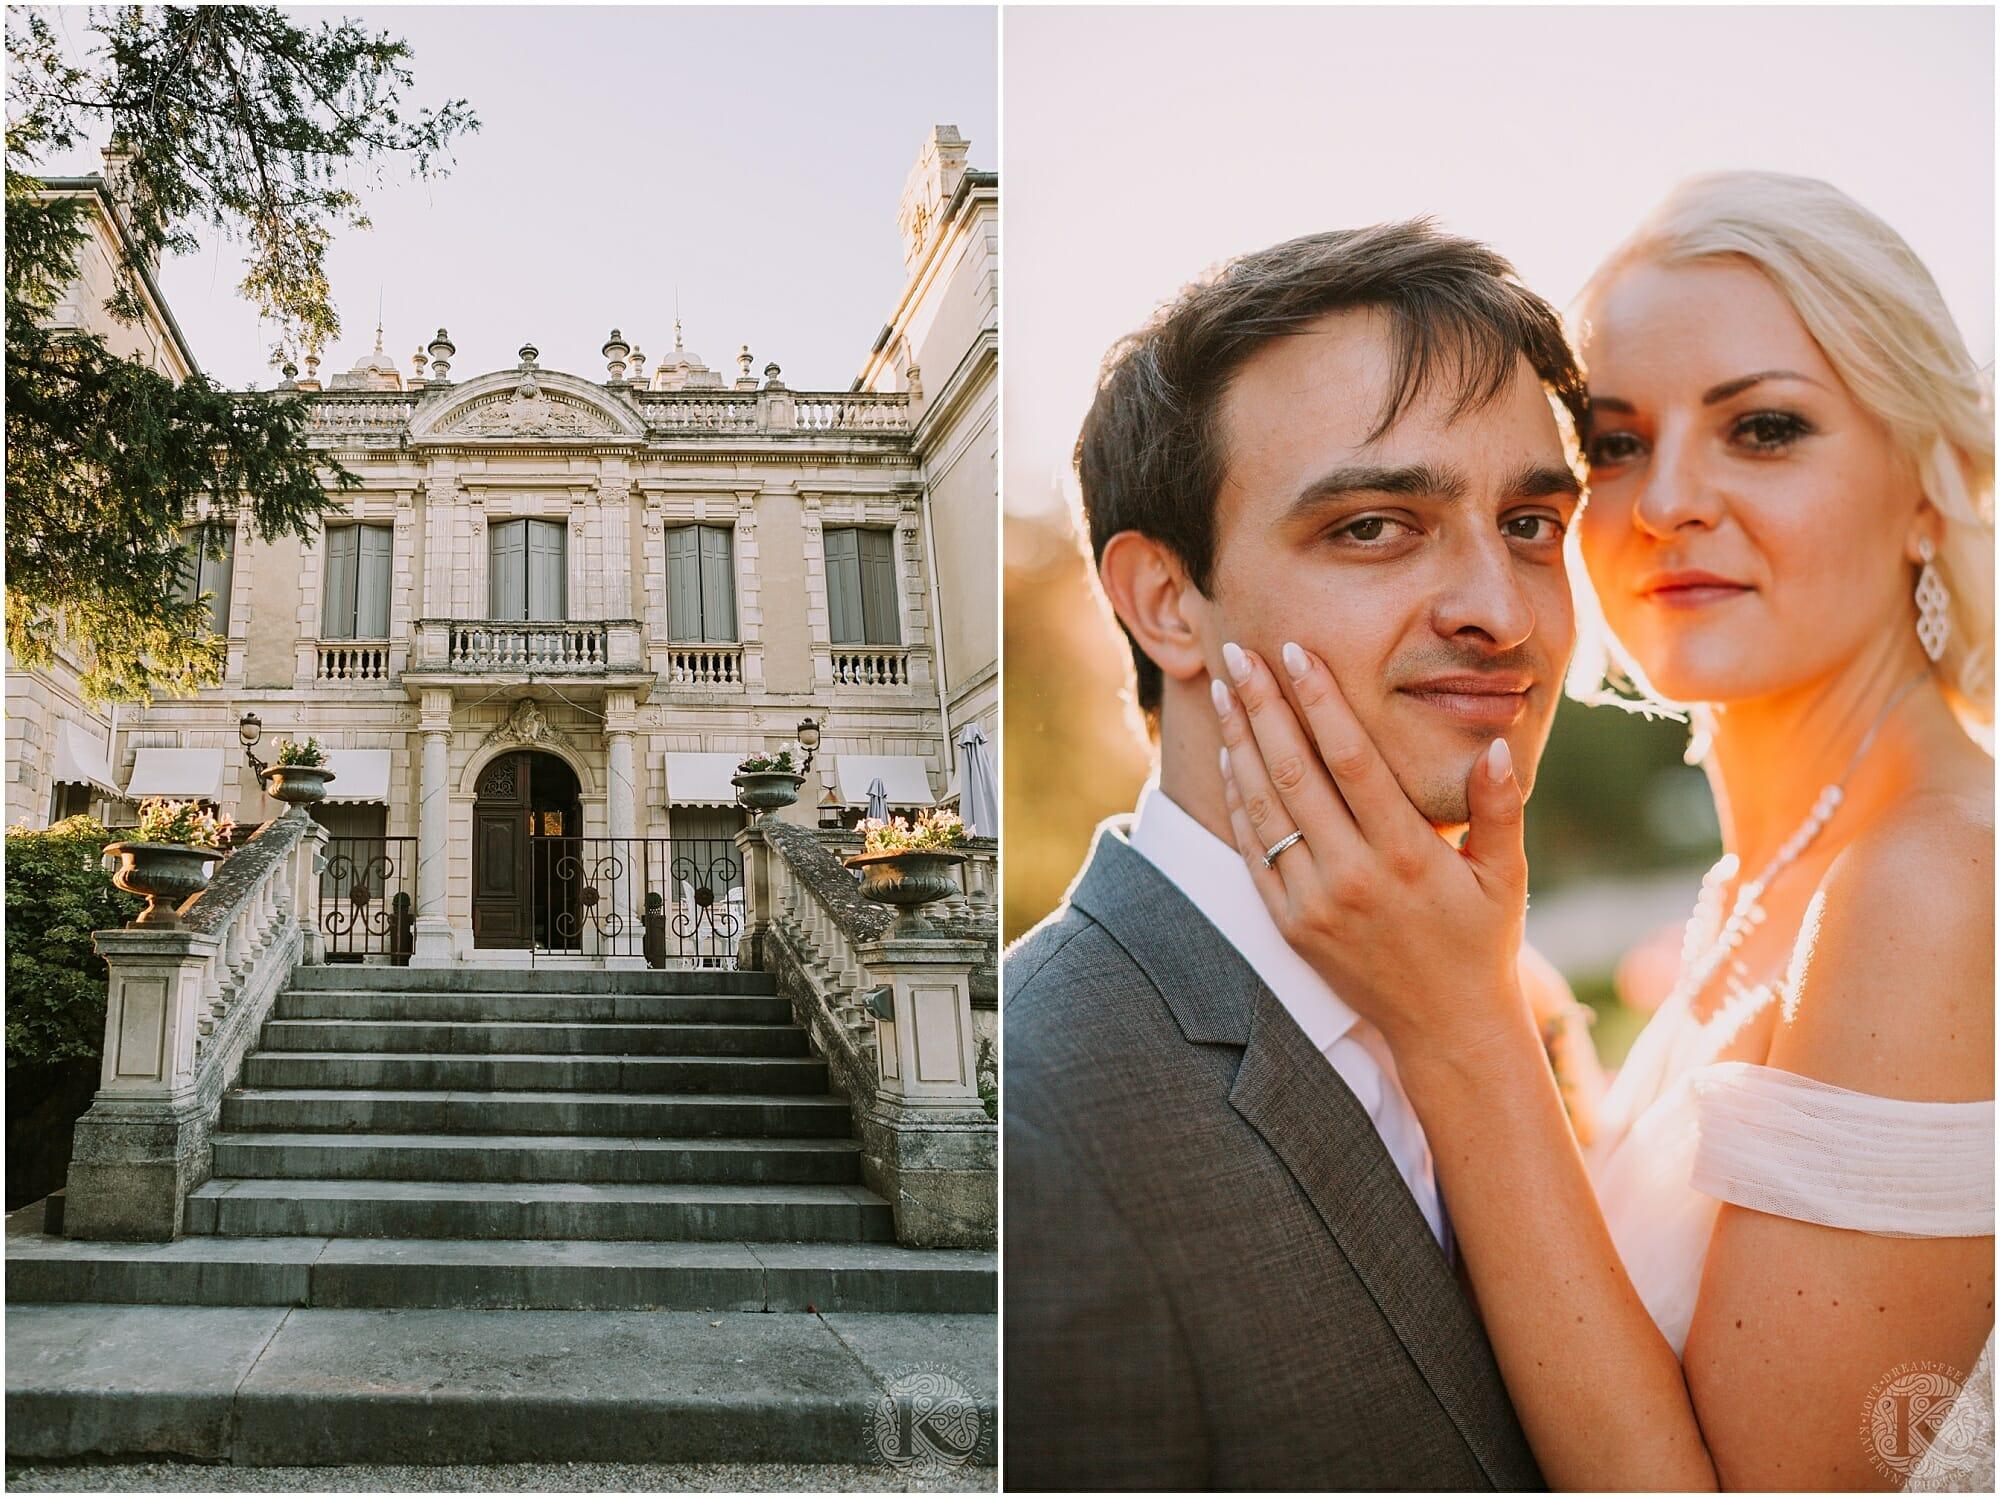 Kateryna-photos-photographe-mariage-chateau-des-3-fontaines-provence-avignon-vaucluse-sud_0100.jpg